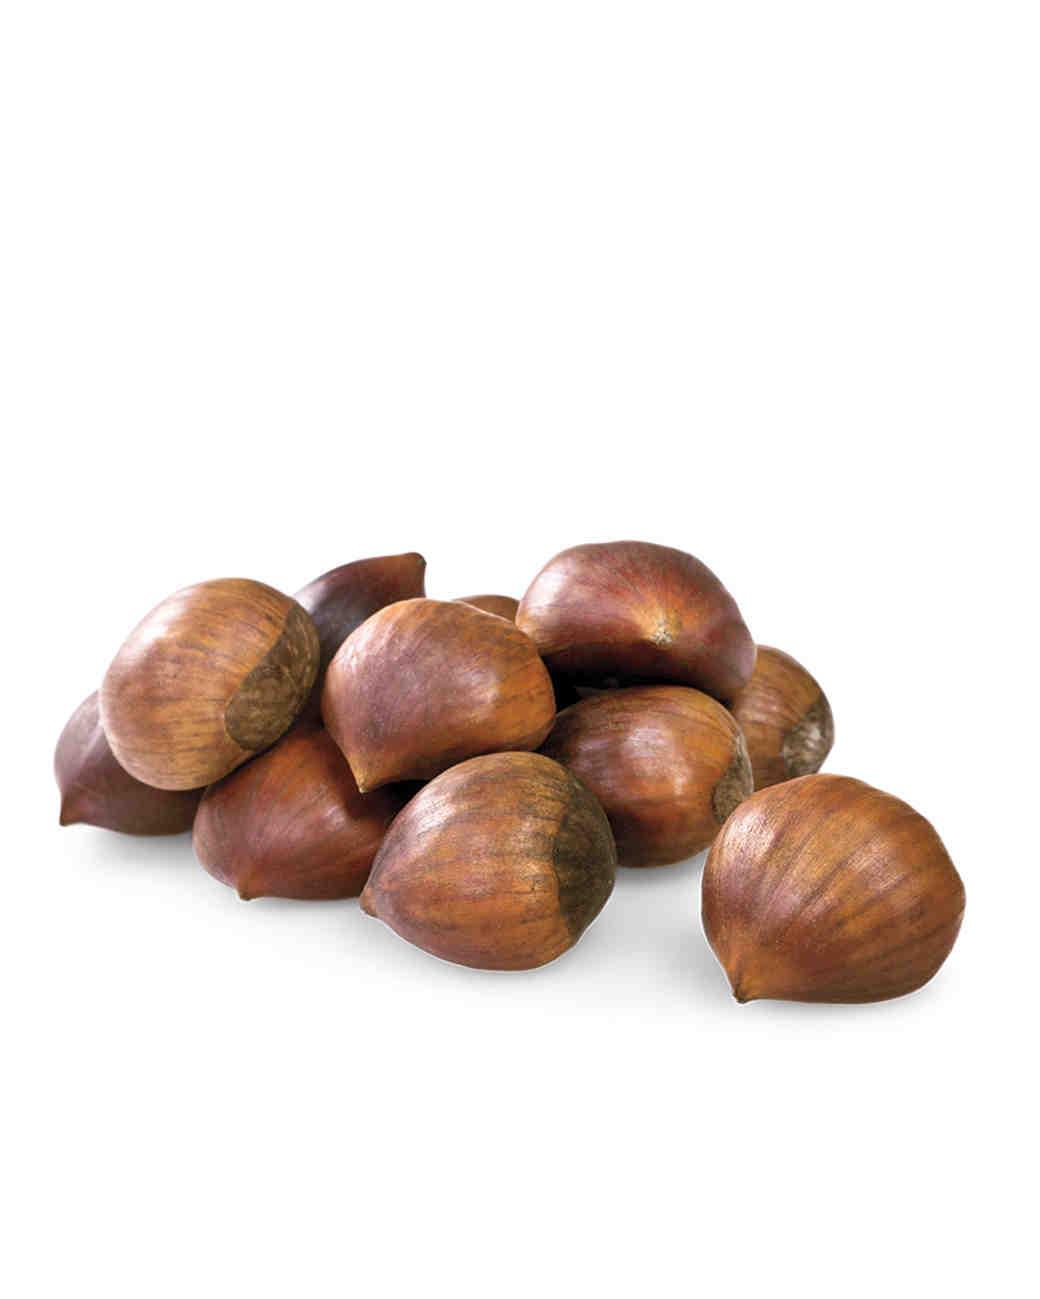 chestnuts-istock-000005193332small-mwds111196.jpg